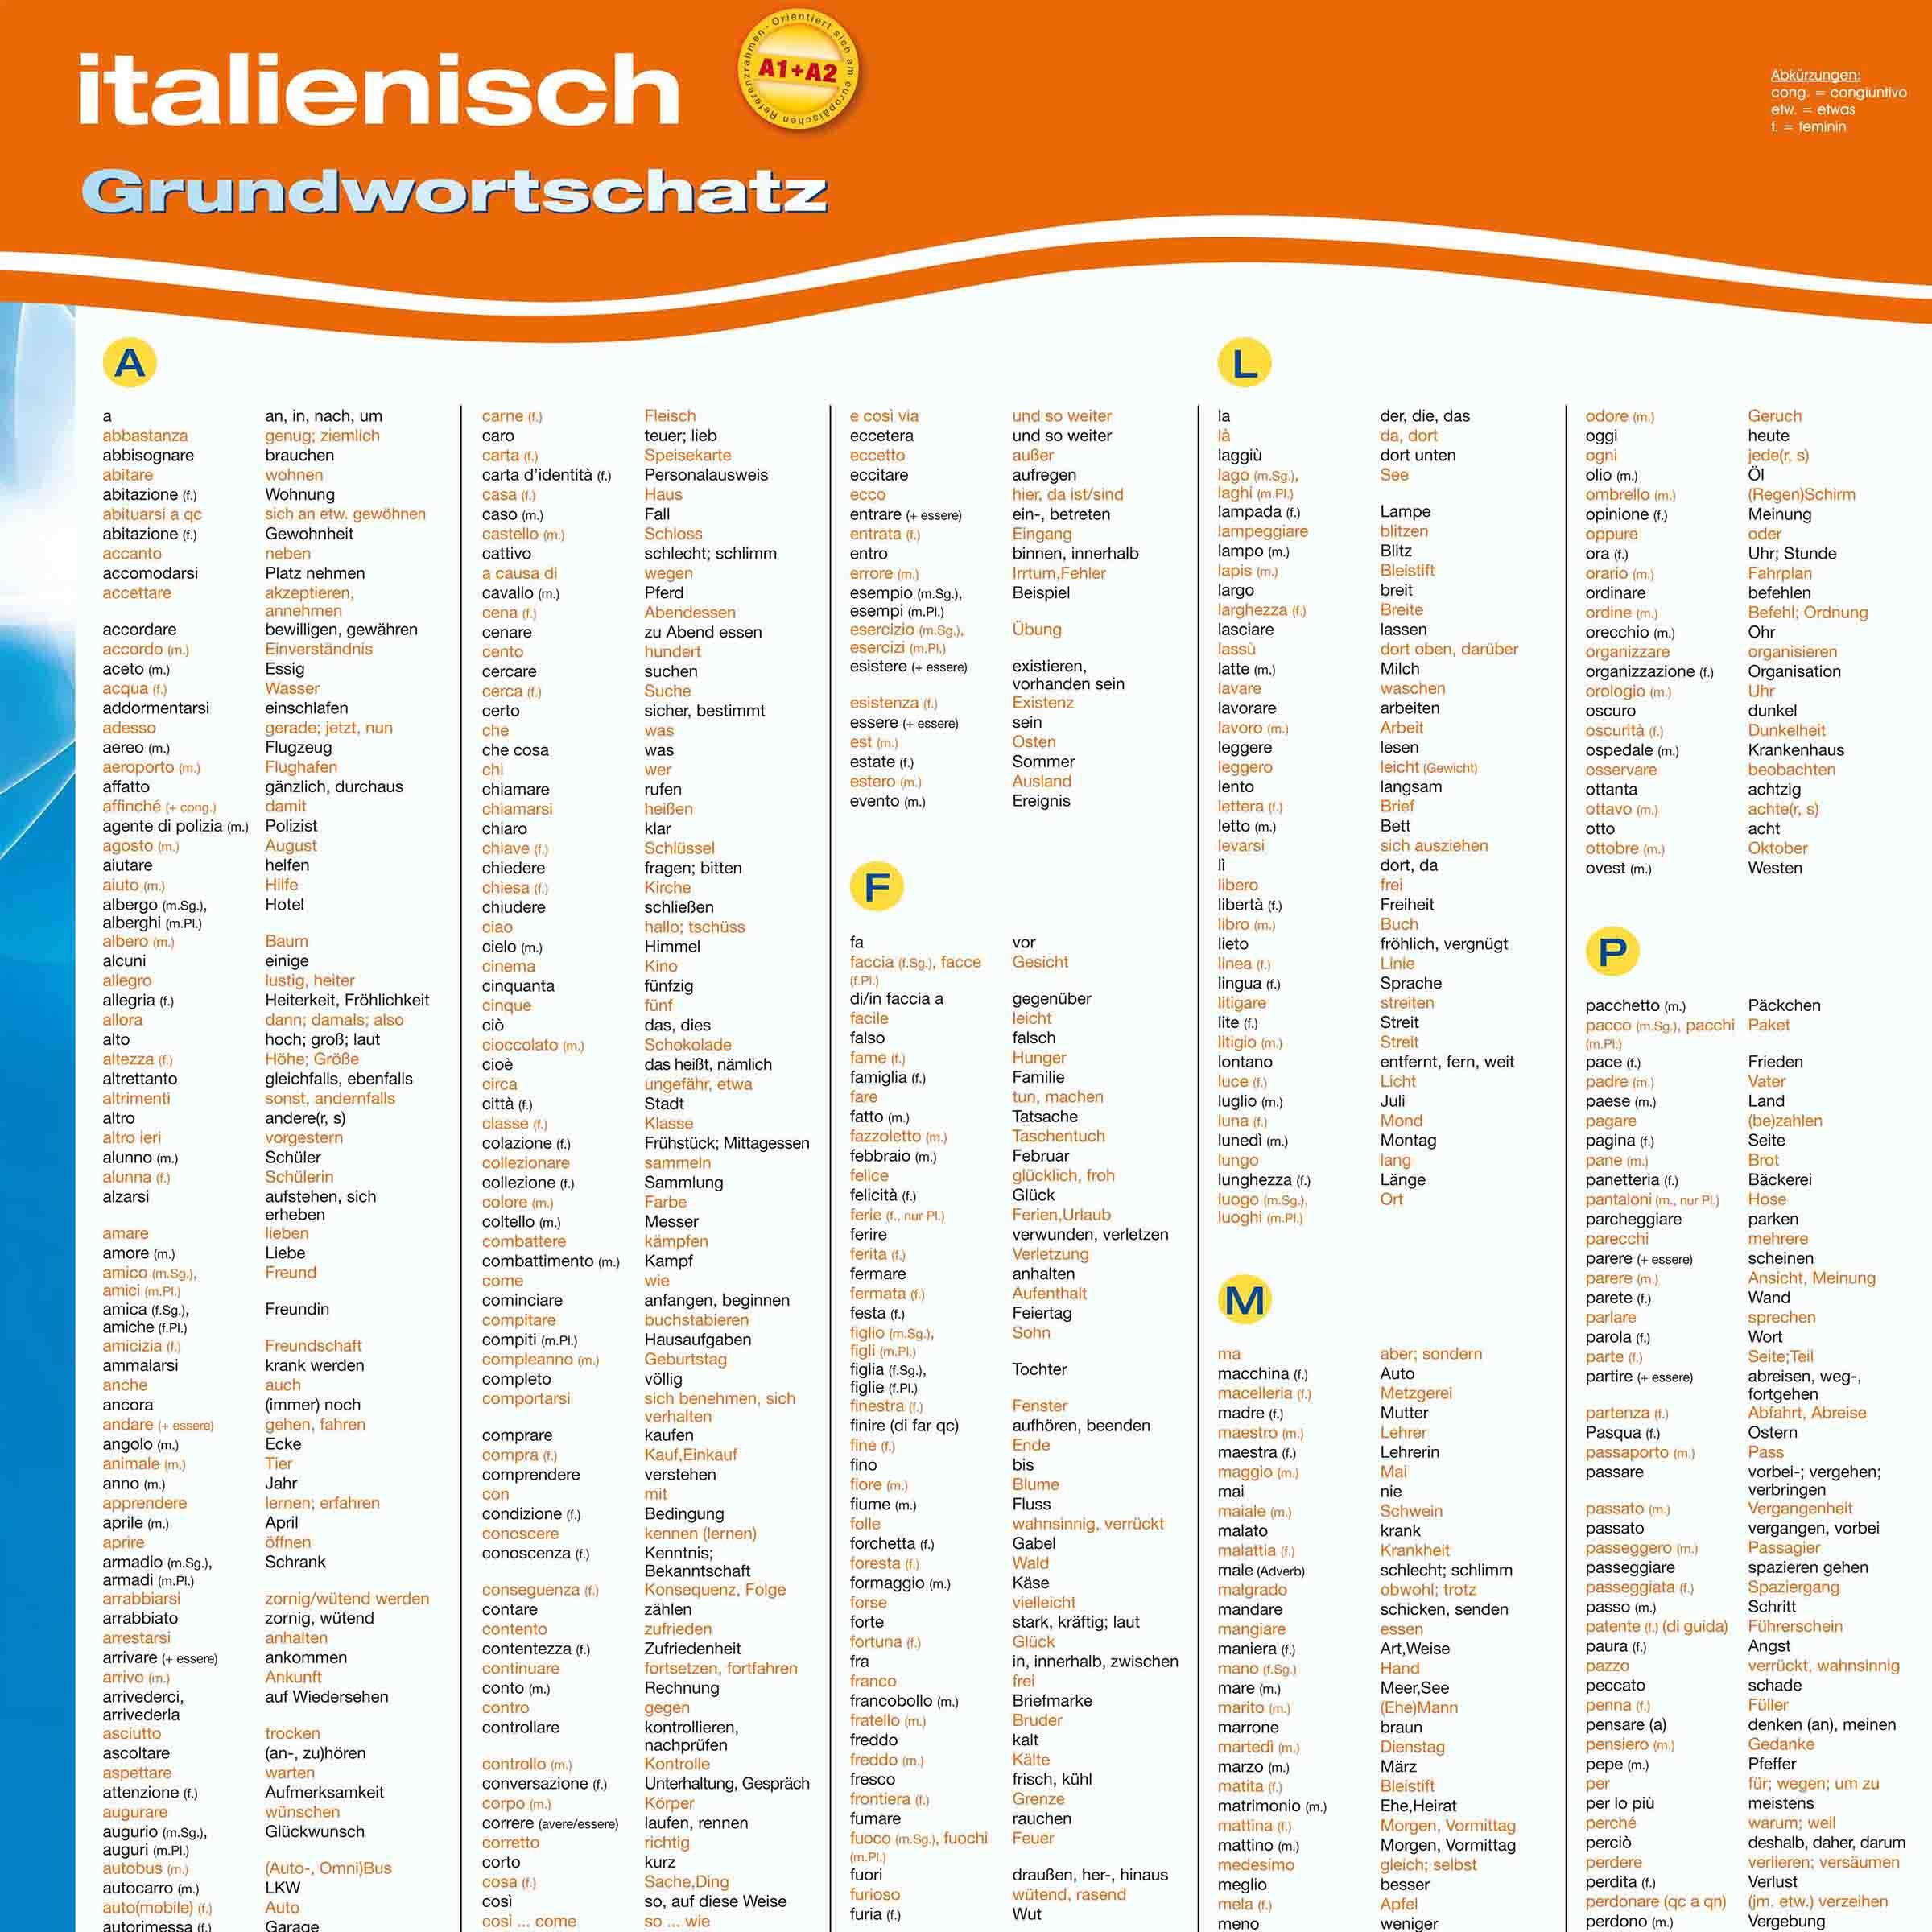 Bekanntschaft italienisch